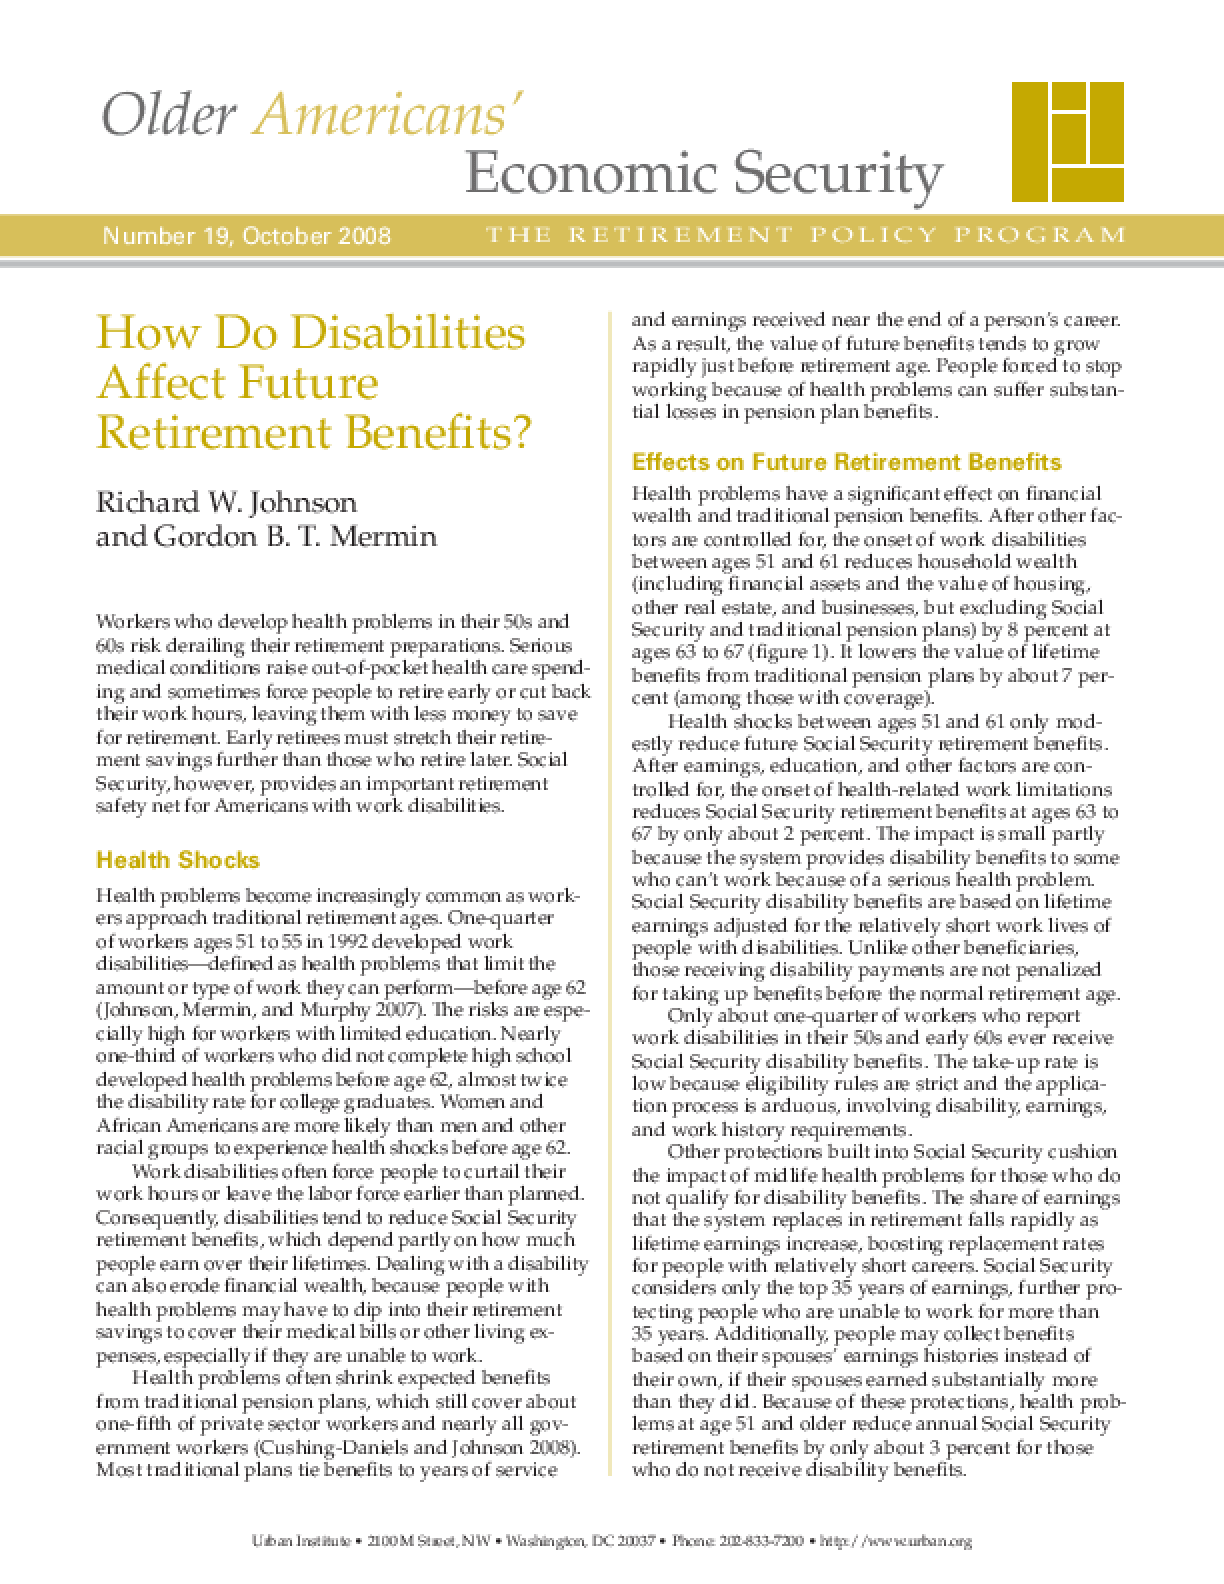 How Do Disabilities Affect Future Retirement Benefits?